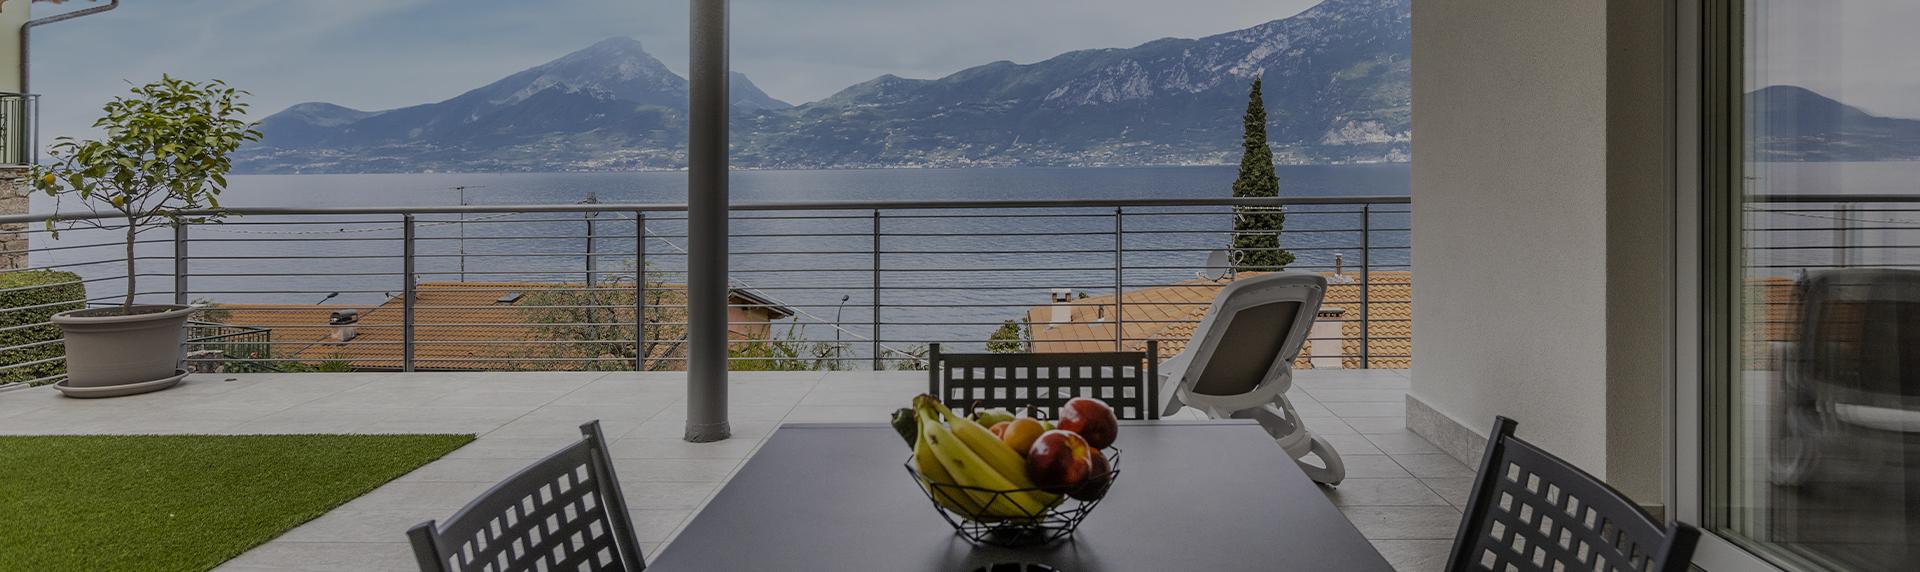 Villaggio Residence Solei: giardino e tanti servizi